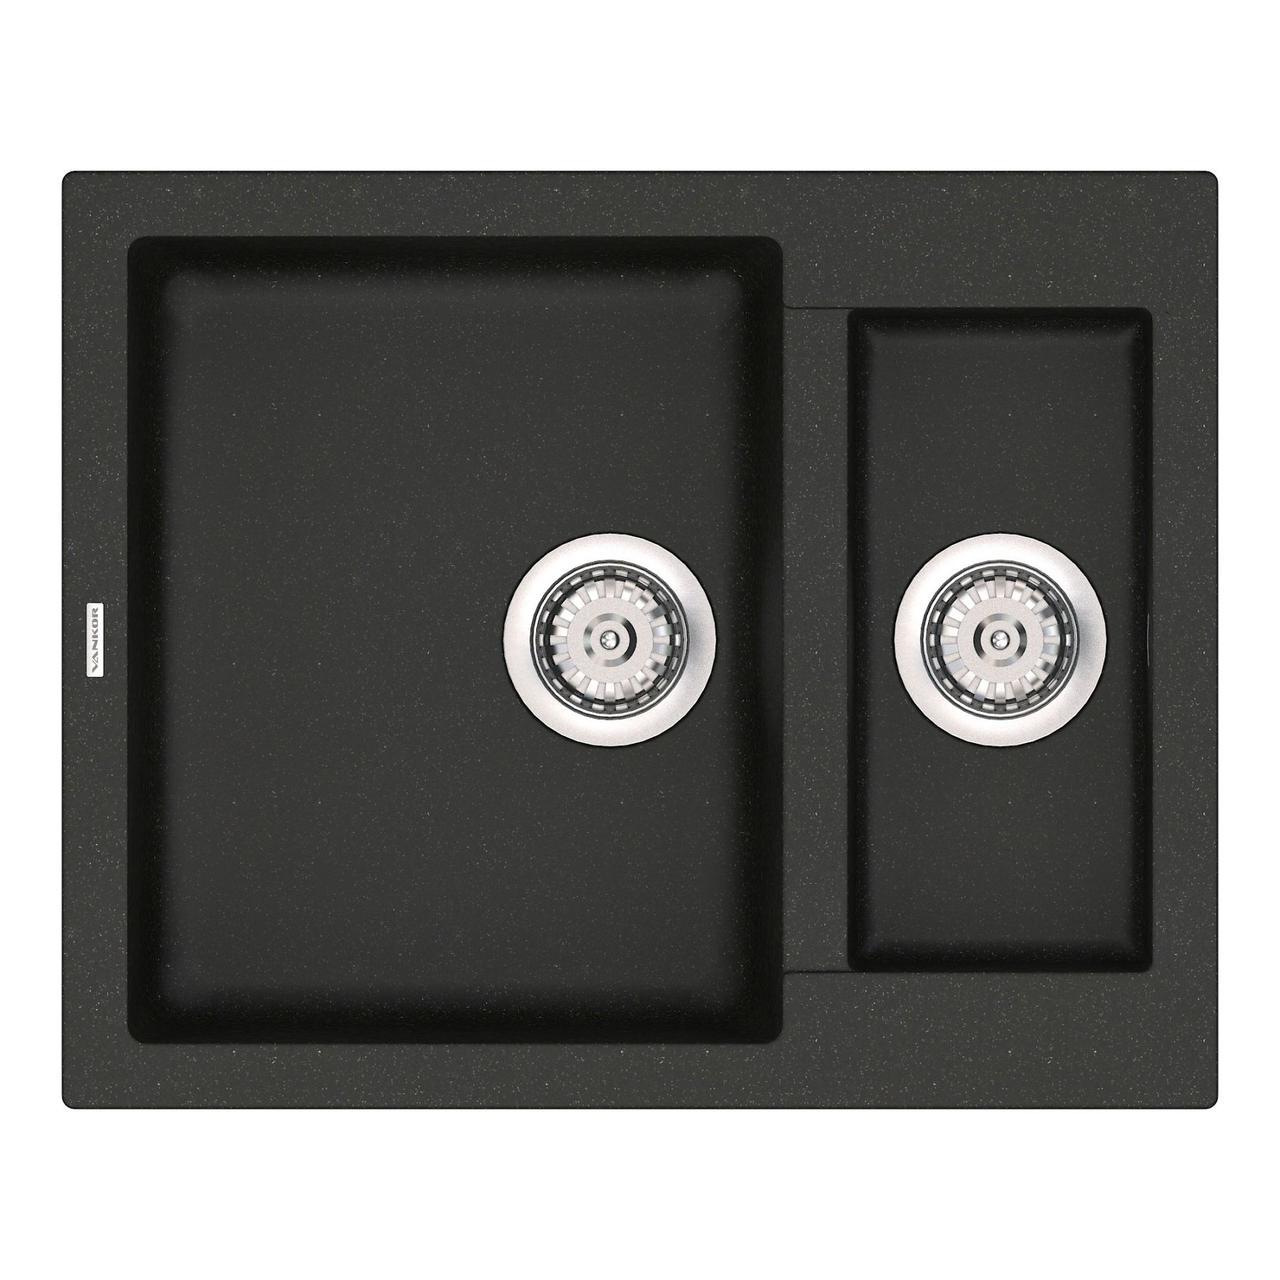 Кухонная мойка кварц 50*61 см VANKOR Orman OMP 03.61 Black